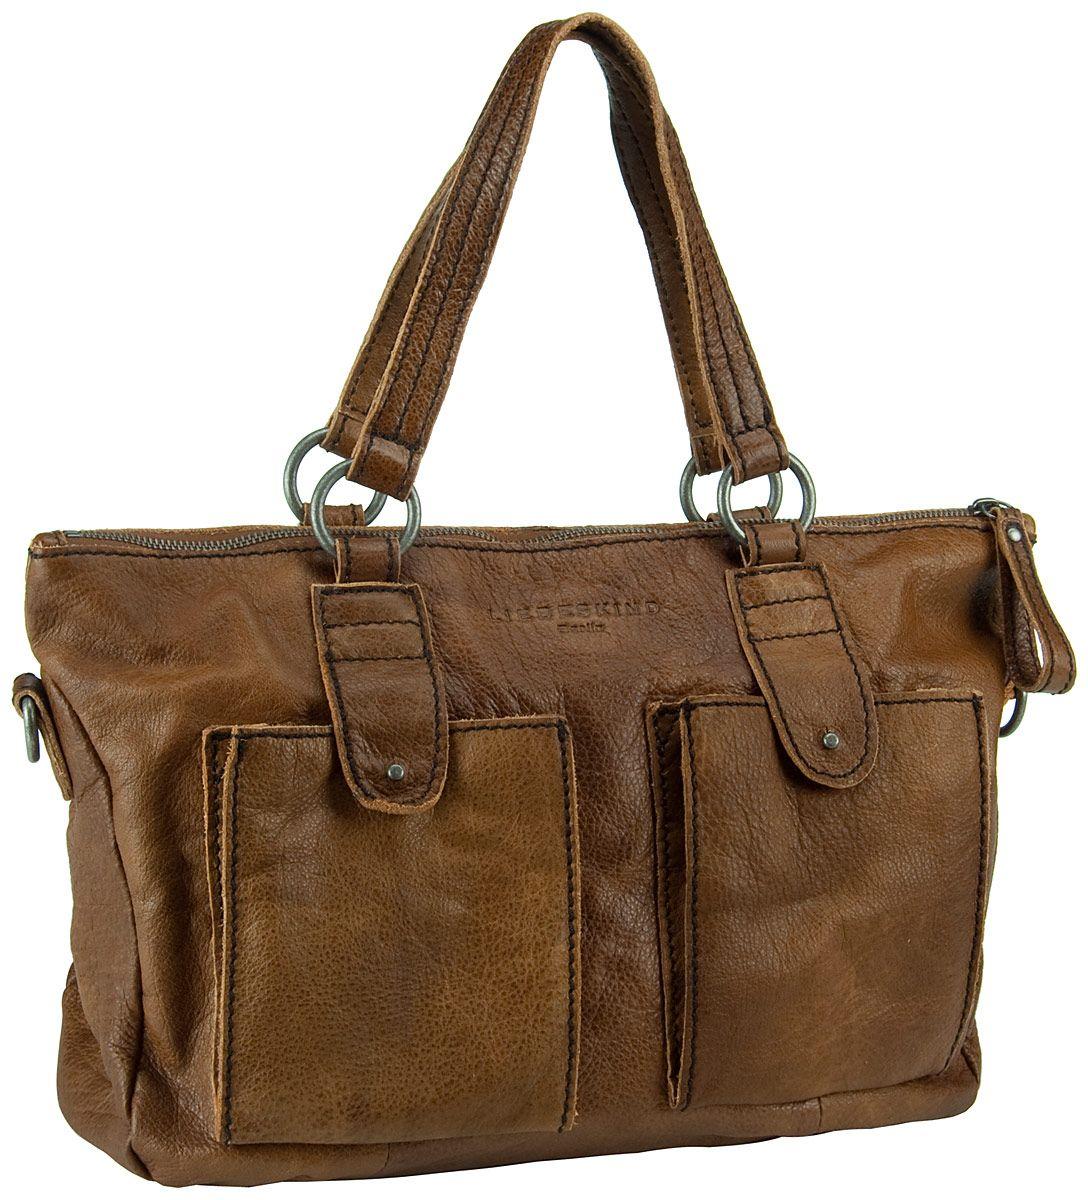 I love this bag!  #cameandleon #tchibogewinnspiel